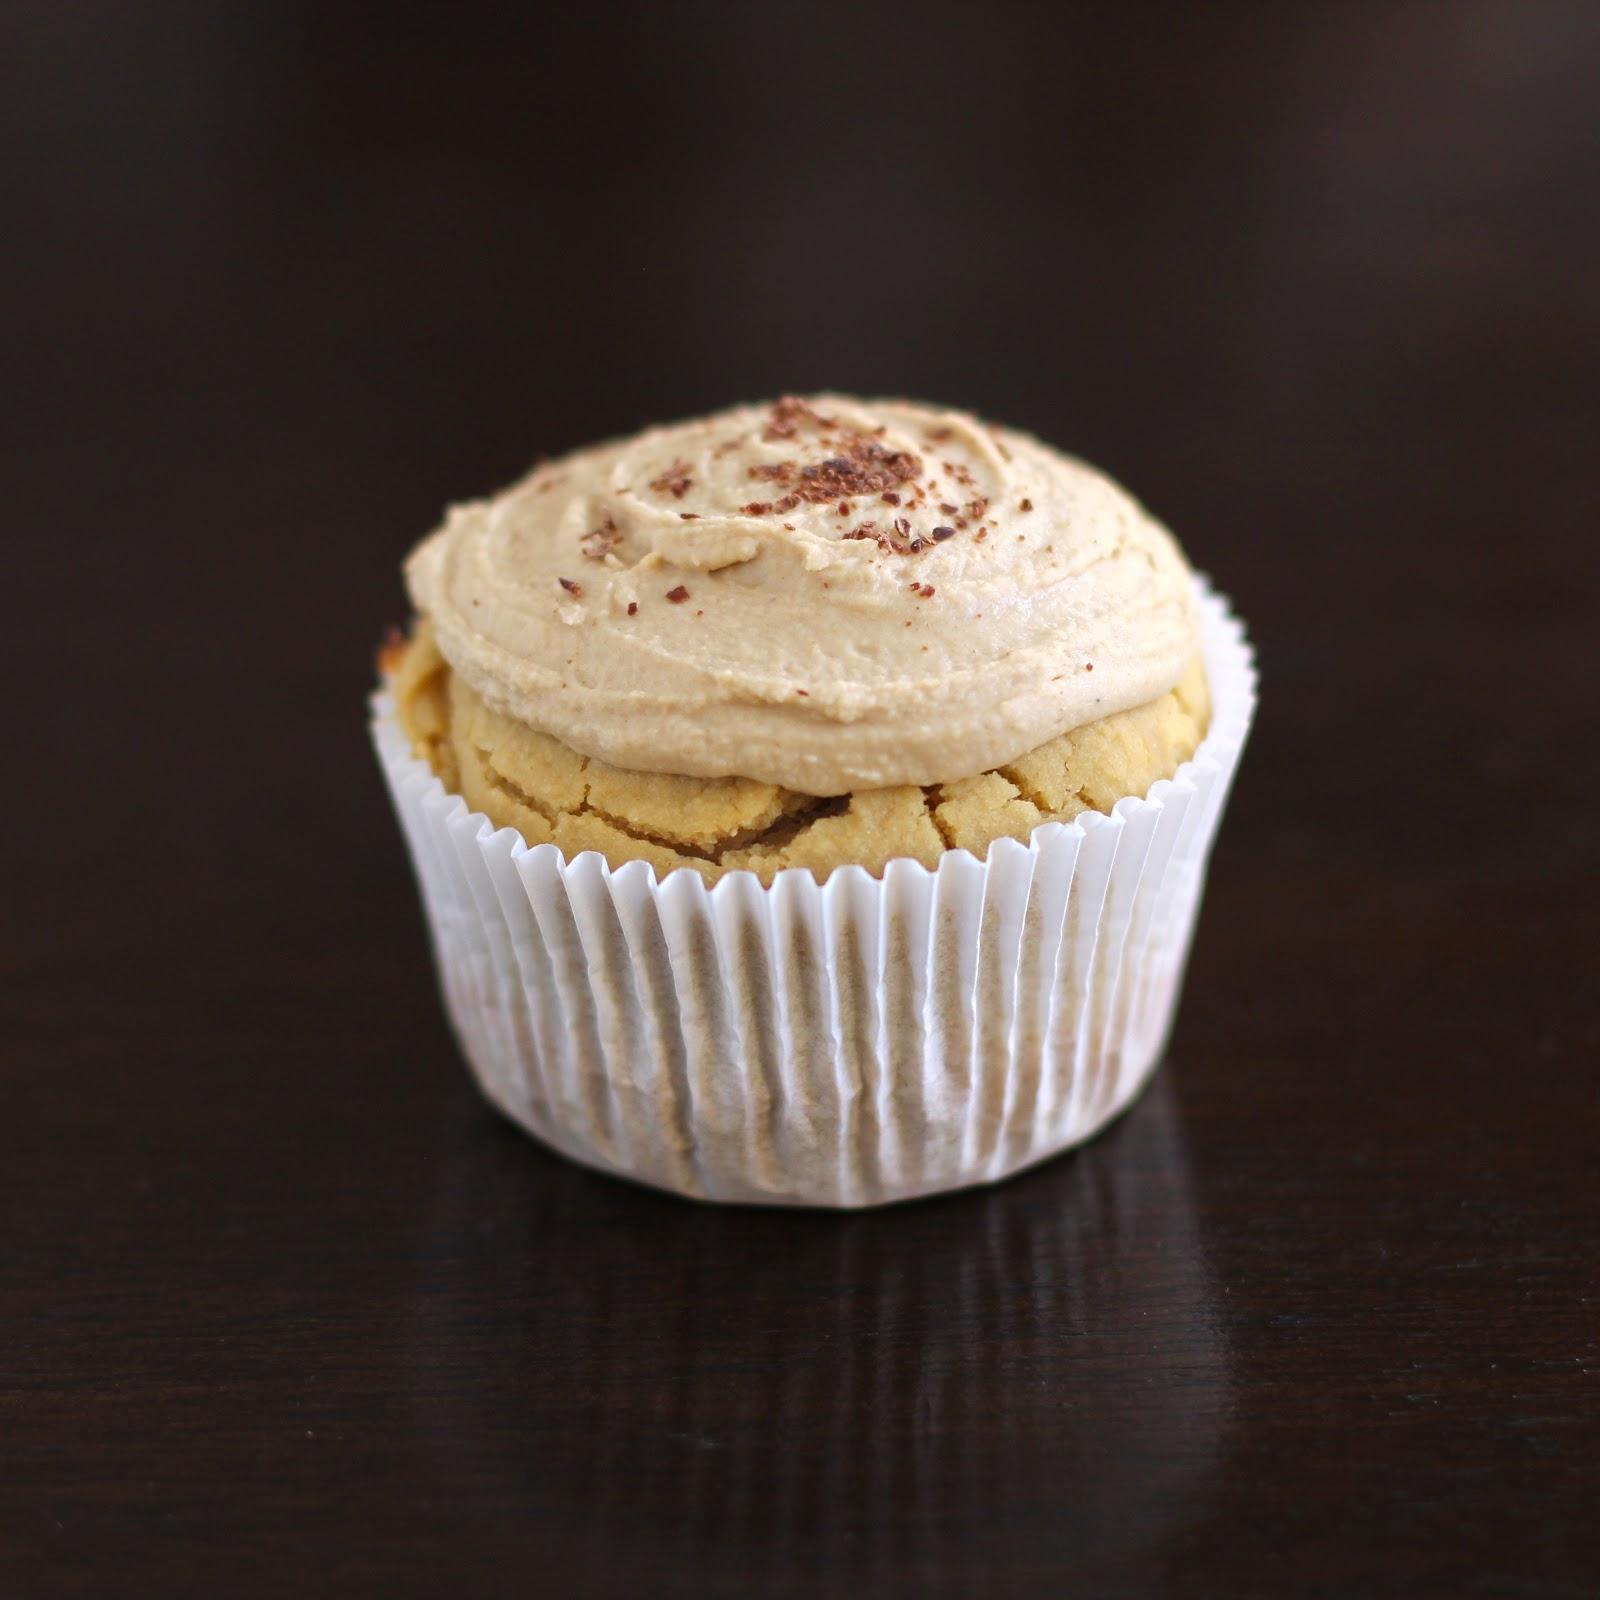 Healthy Vanilla Toffee Quinoa Cupcakes (gluten free, vegan)